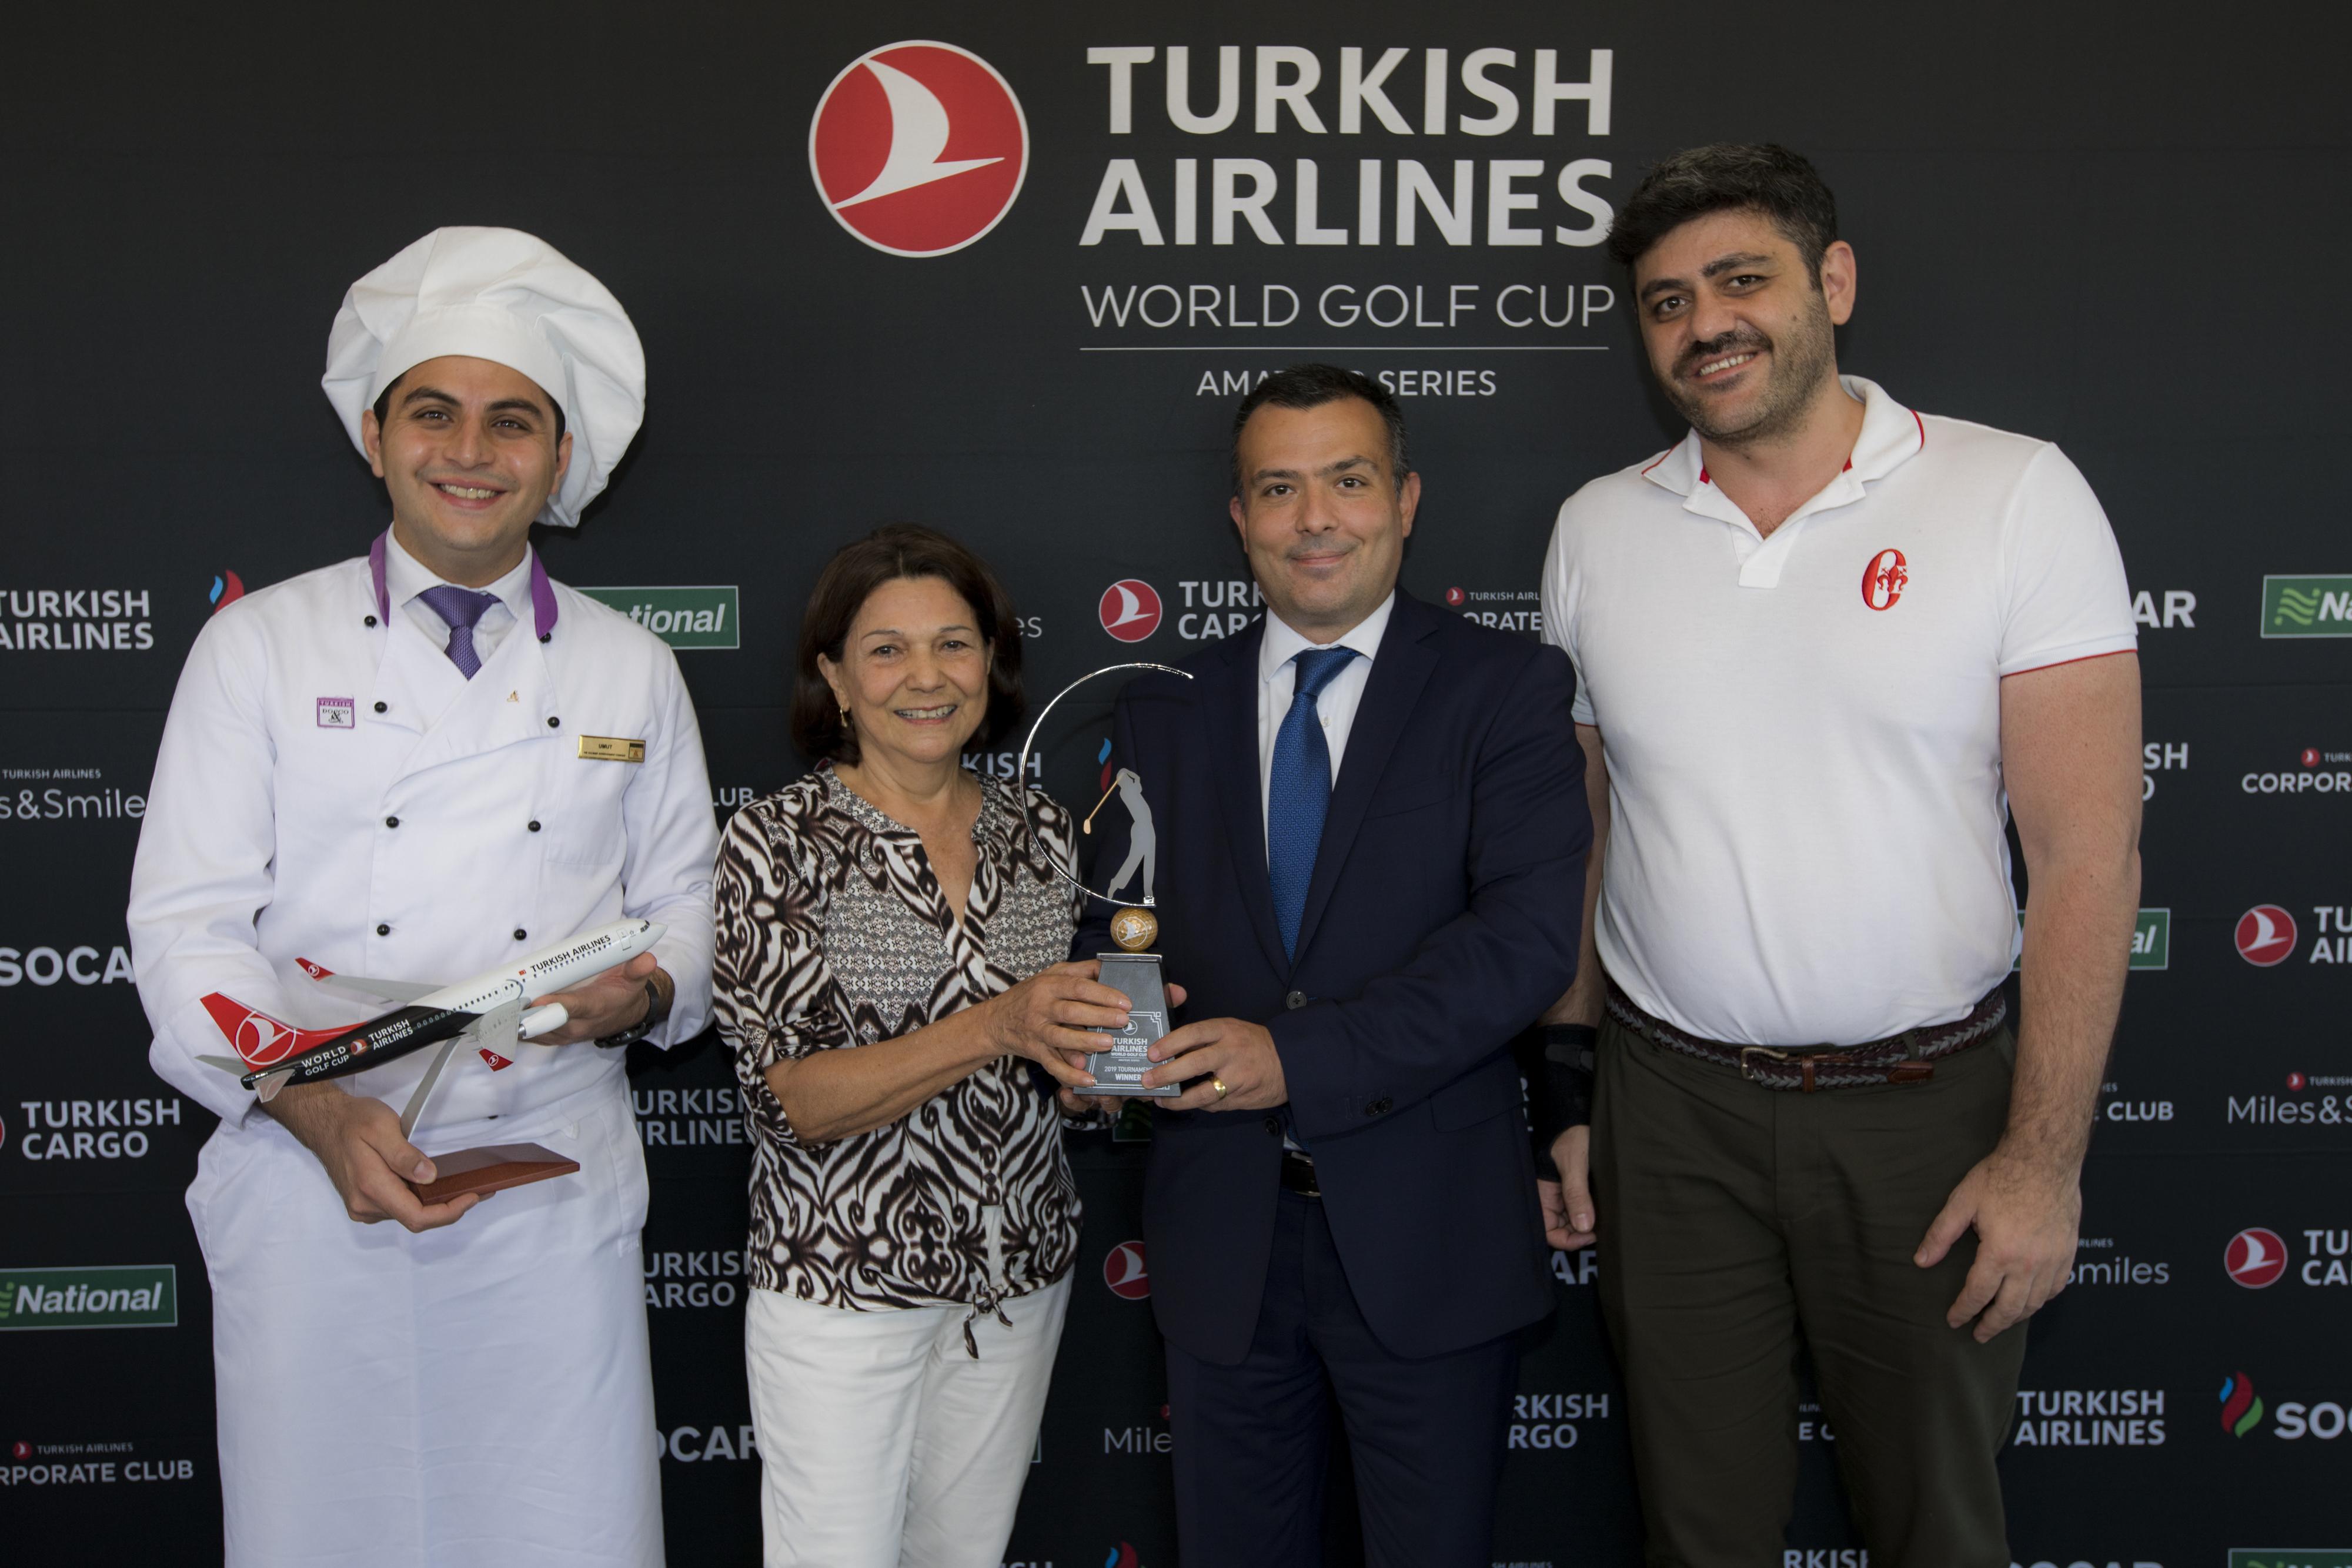 Graciela Jordan vence a etapa Brasil do Turkish Airlines World Golf Cup 2019